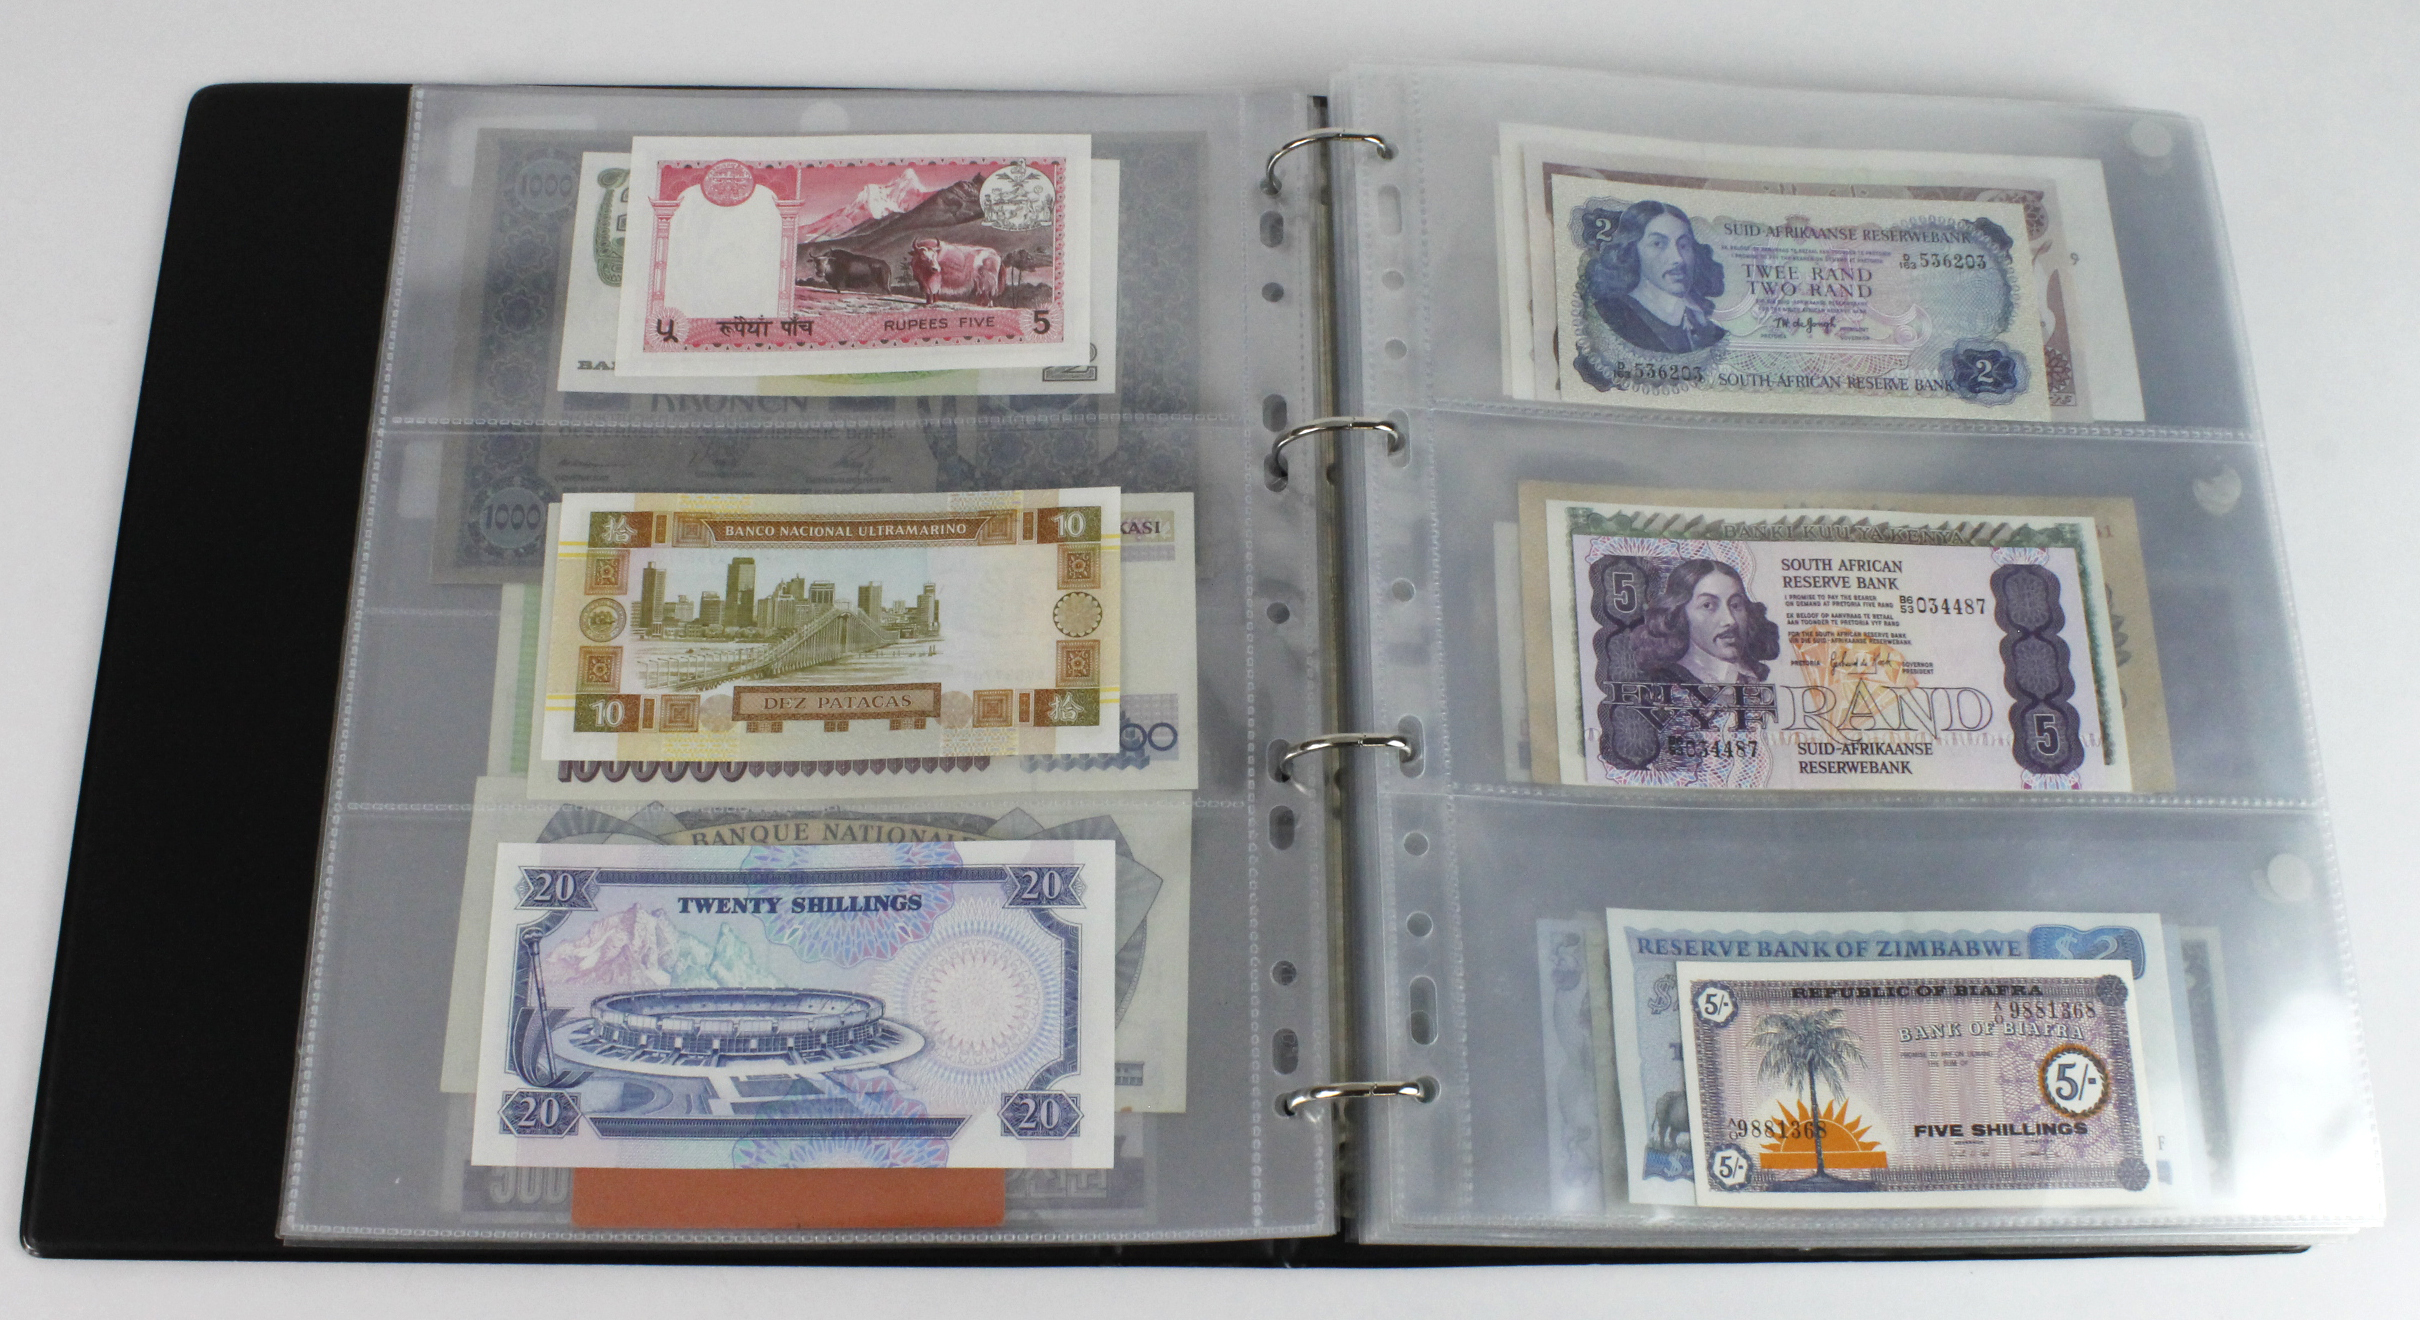 World (163), in banknote album including Bahamas, Spain, Sweden, Netherlands, Algeria, Macau, - Image 9 of 57